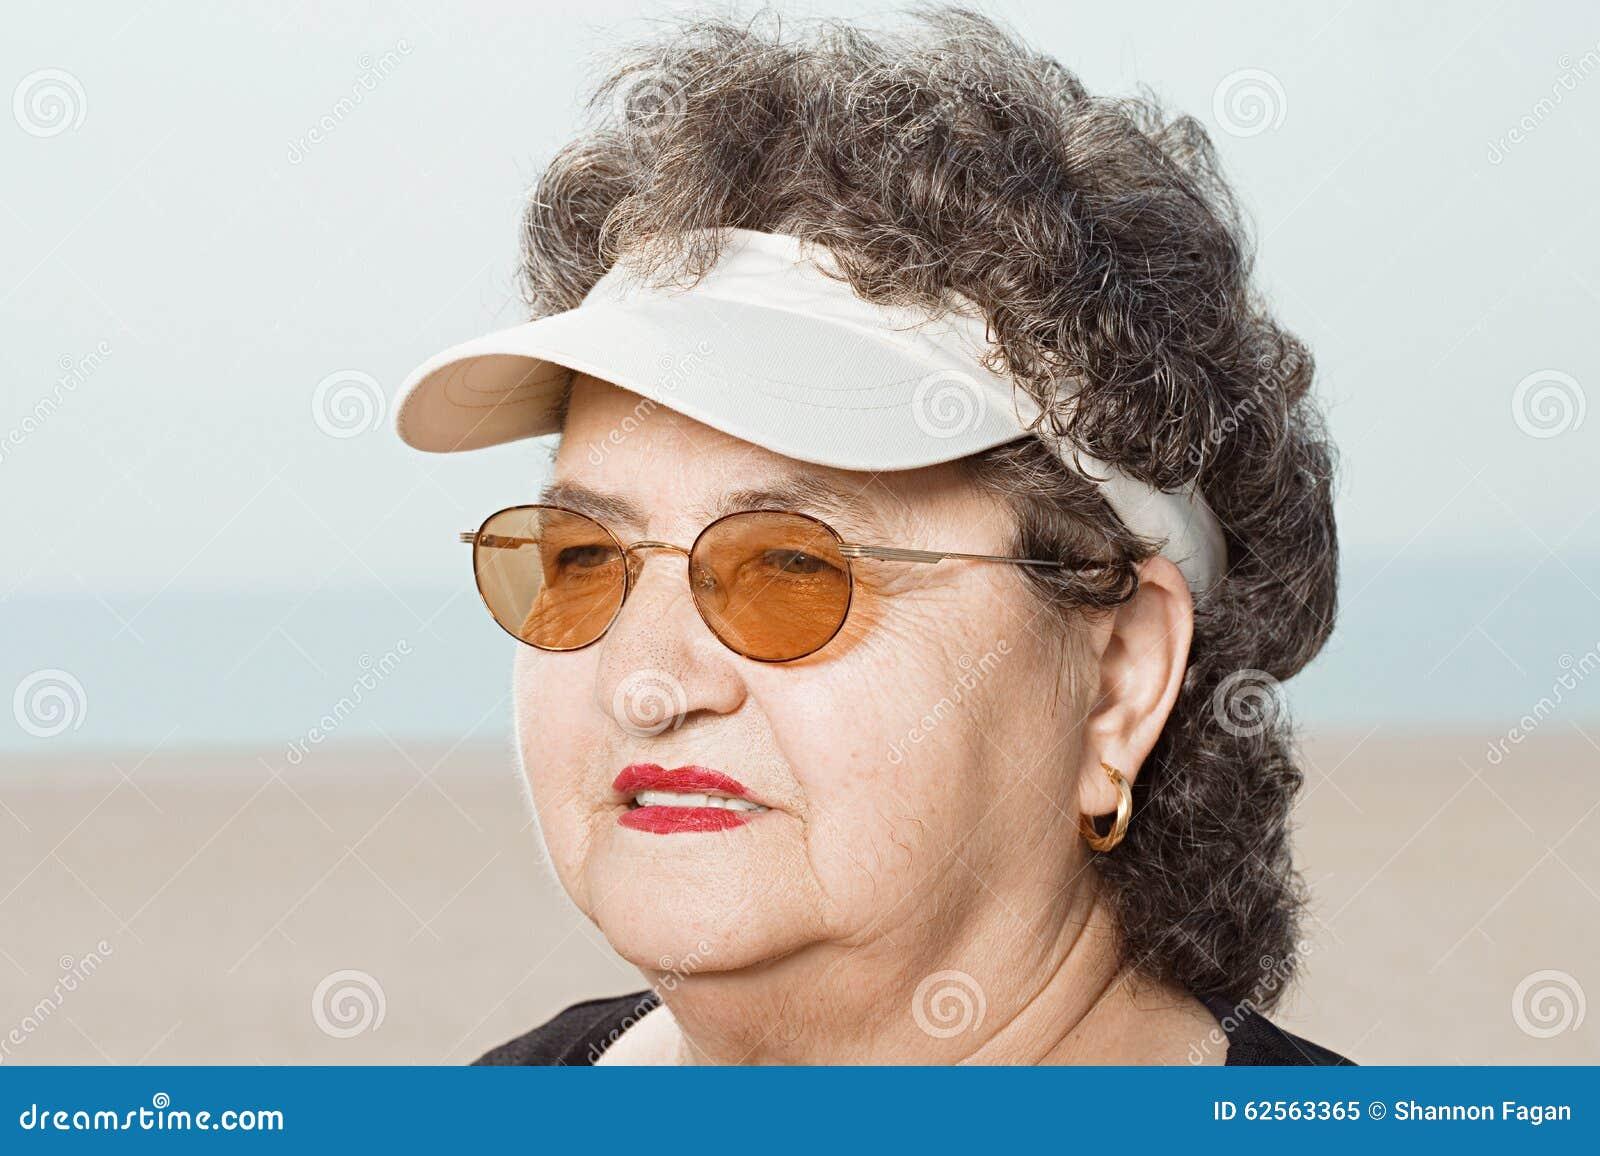 c8e9cb48 Woman wearing a sun visor stock image. Image of looking - 62563365